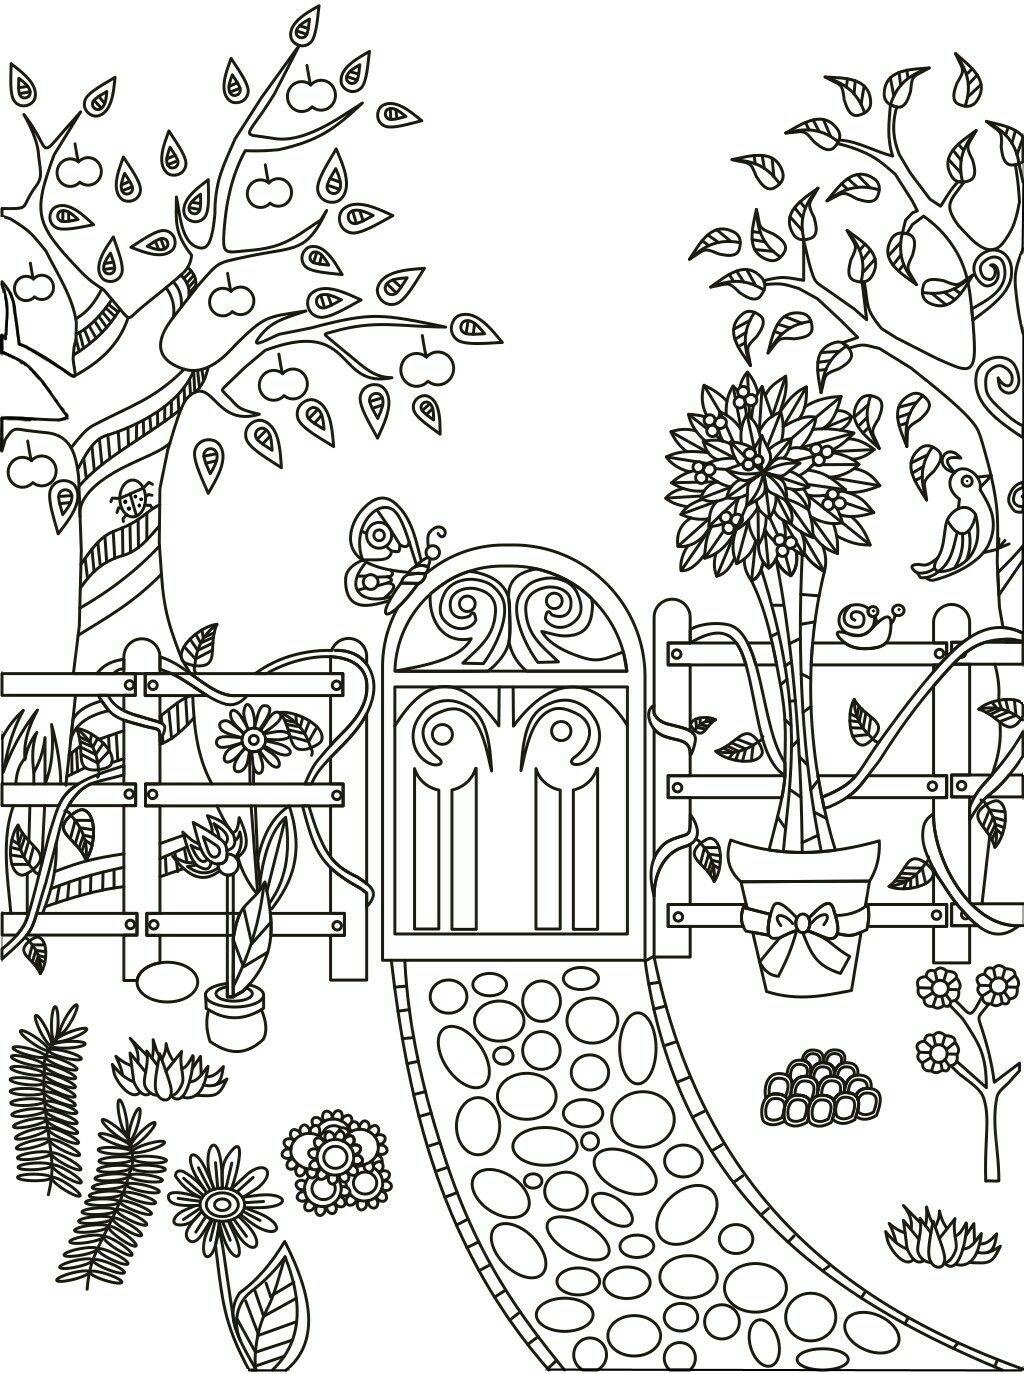 garden coloring page # 1